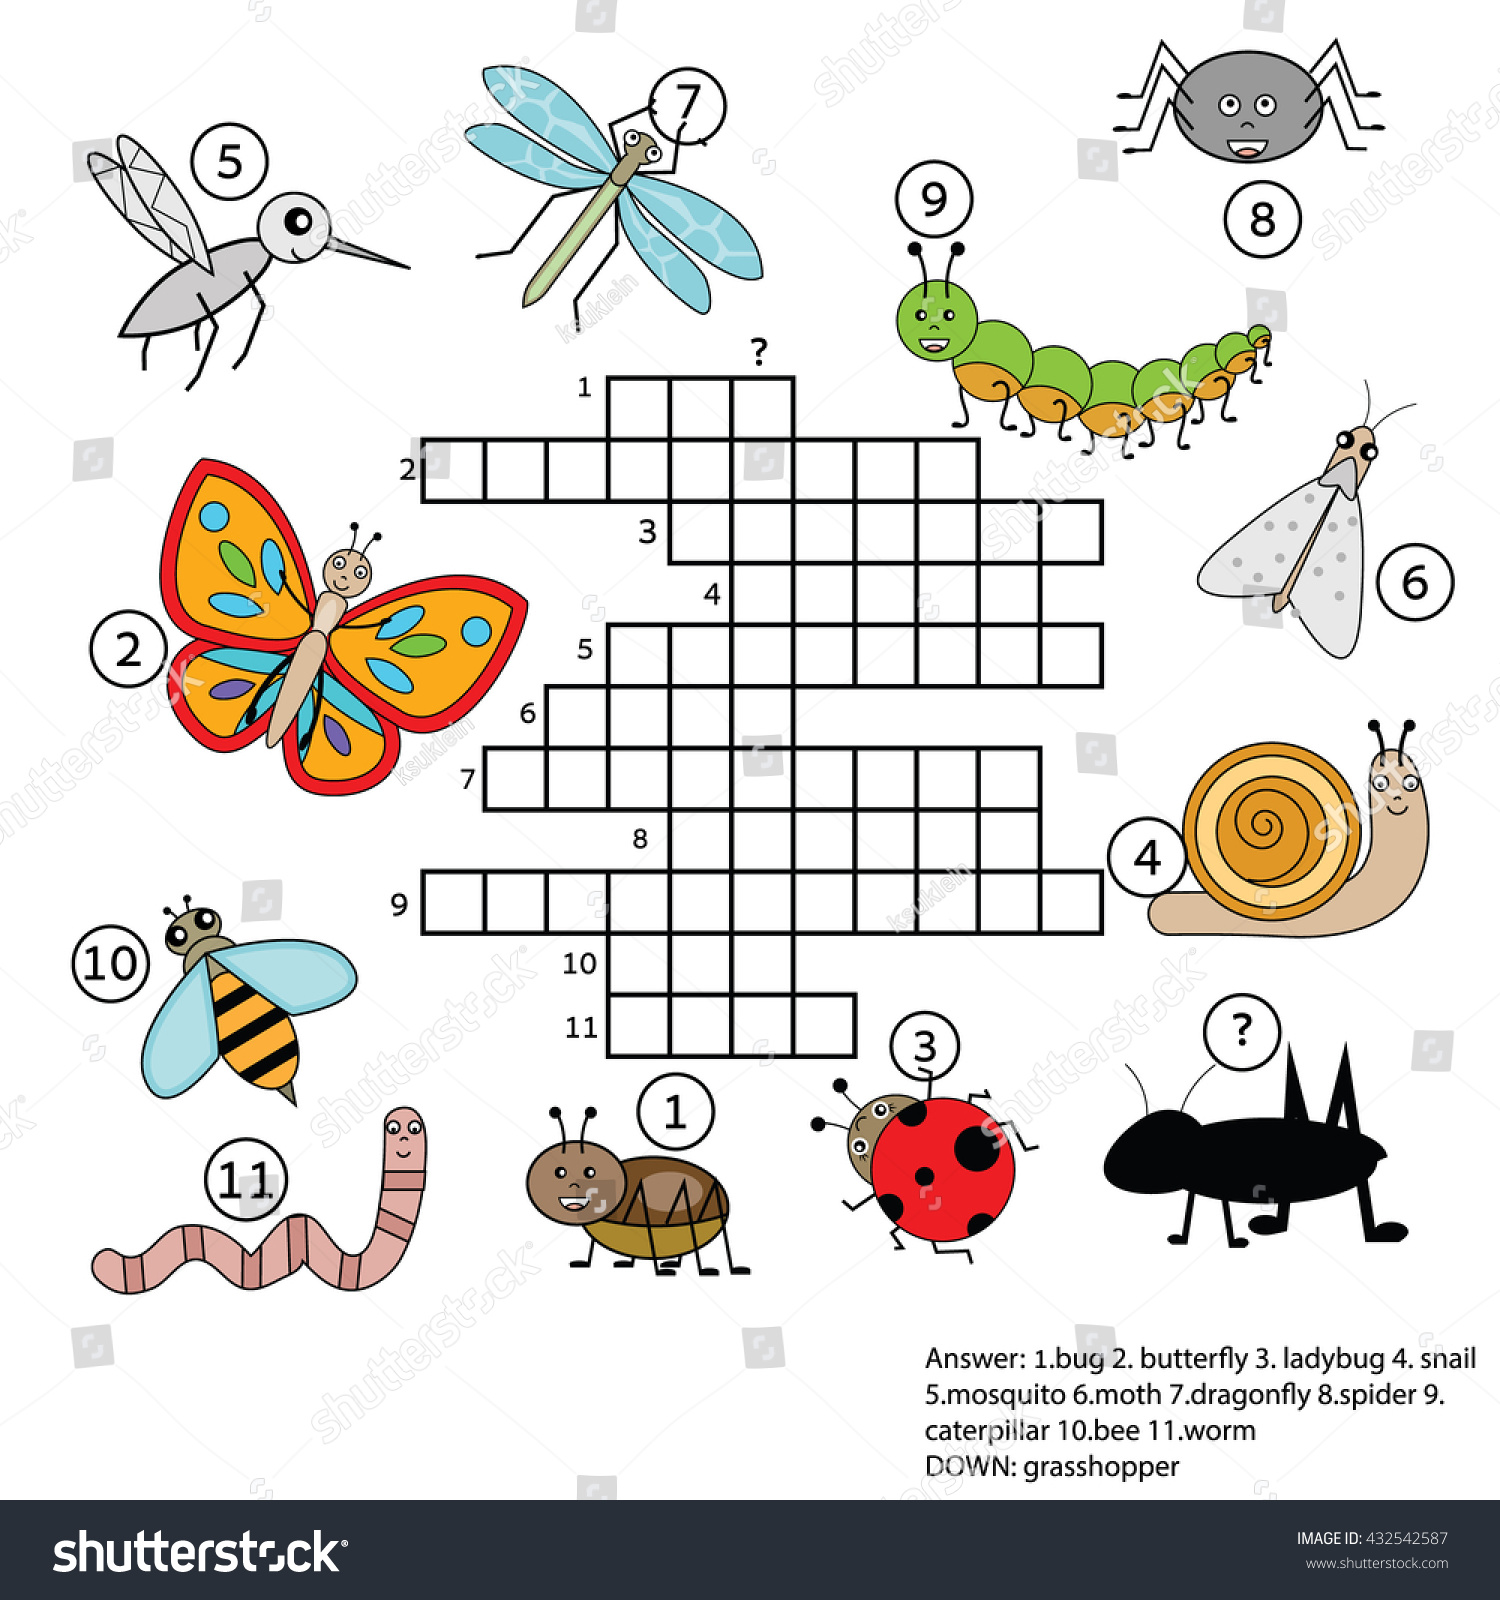 Crossword Educational Children Game Answer Learning Stock